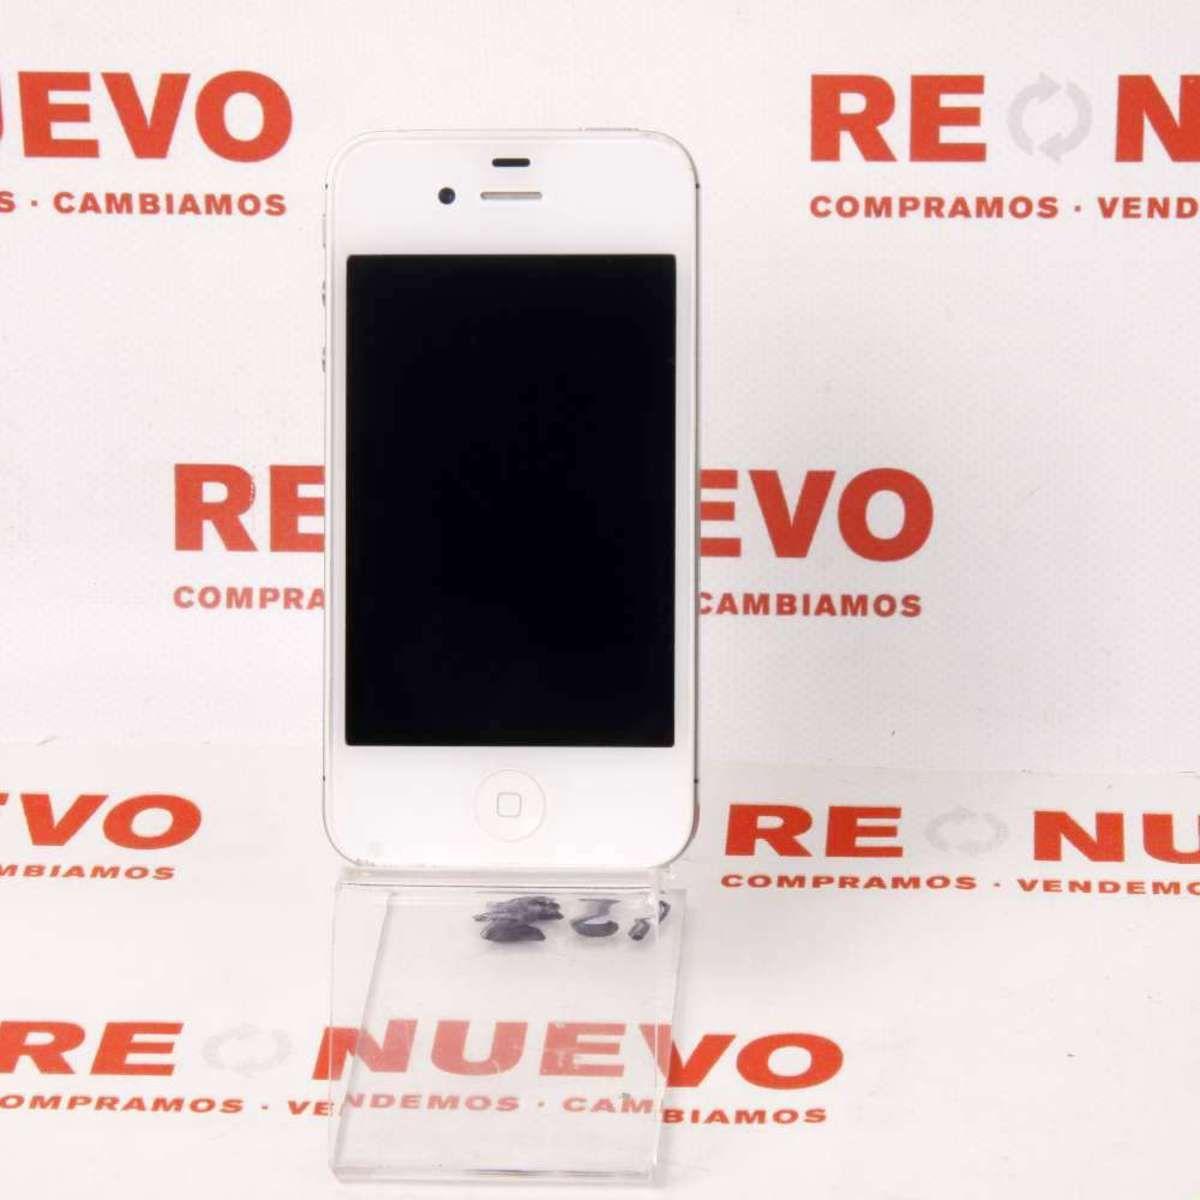 Móvil IPHONE 4S 16GB Libre E269410# Iphone 4# De segunda mano# APPLE